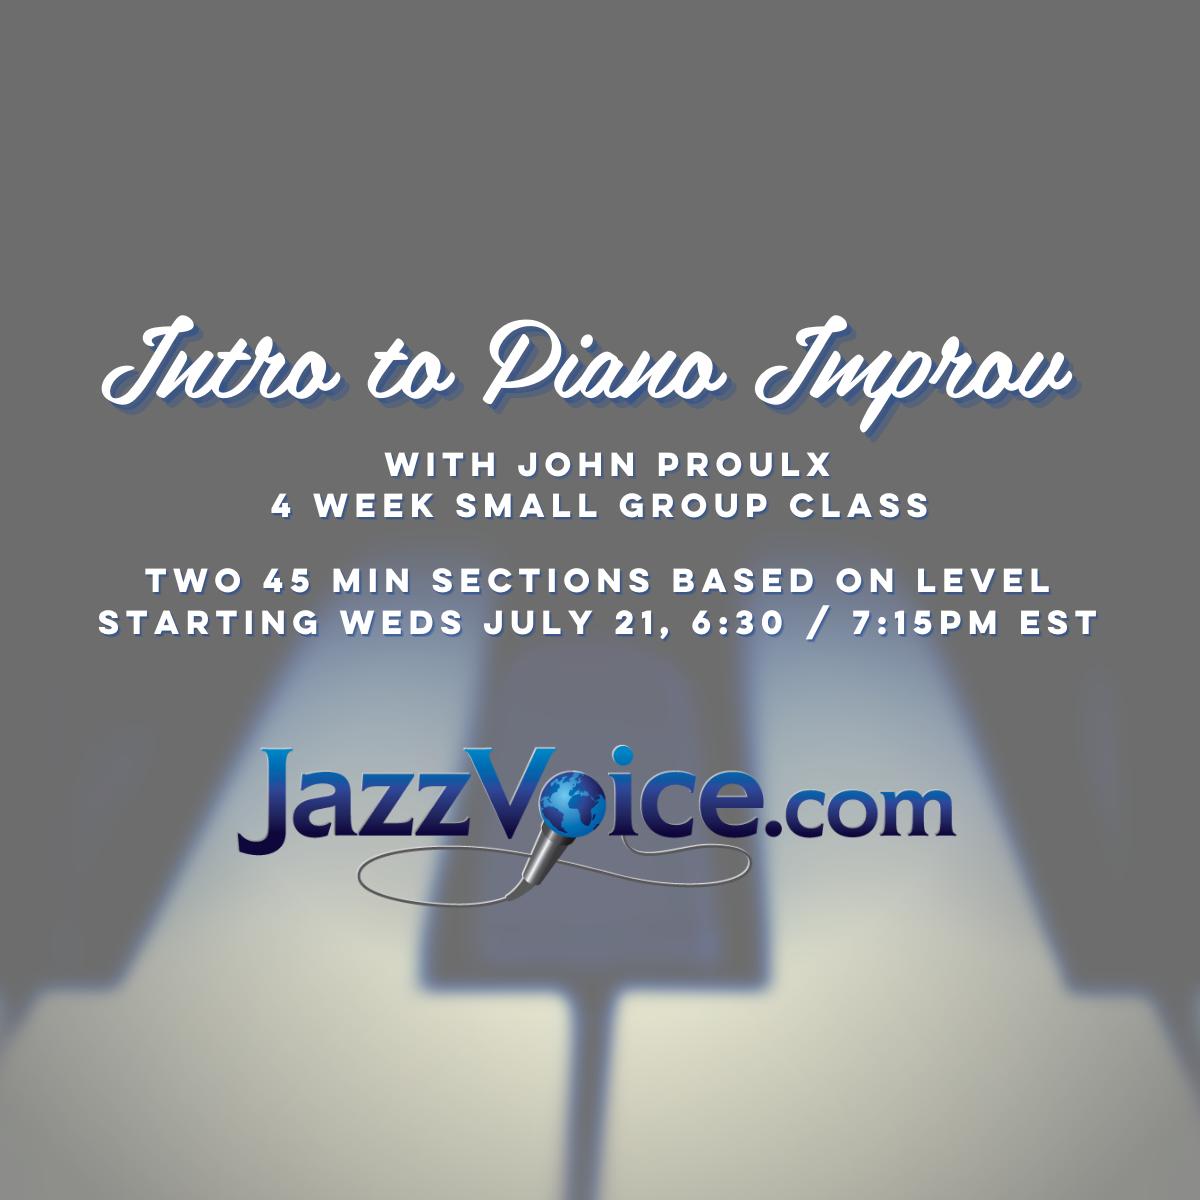 Intro to Piano Improv